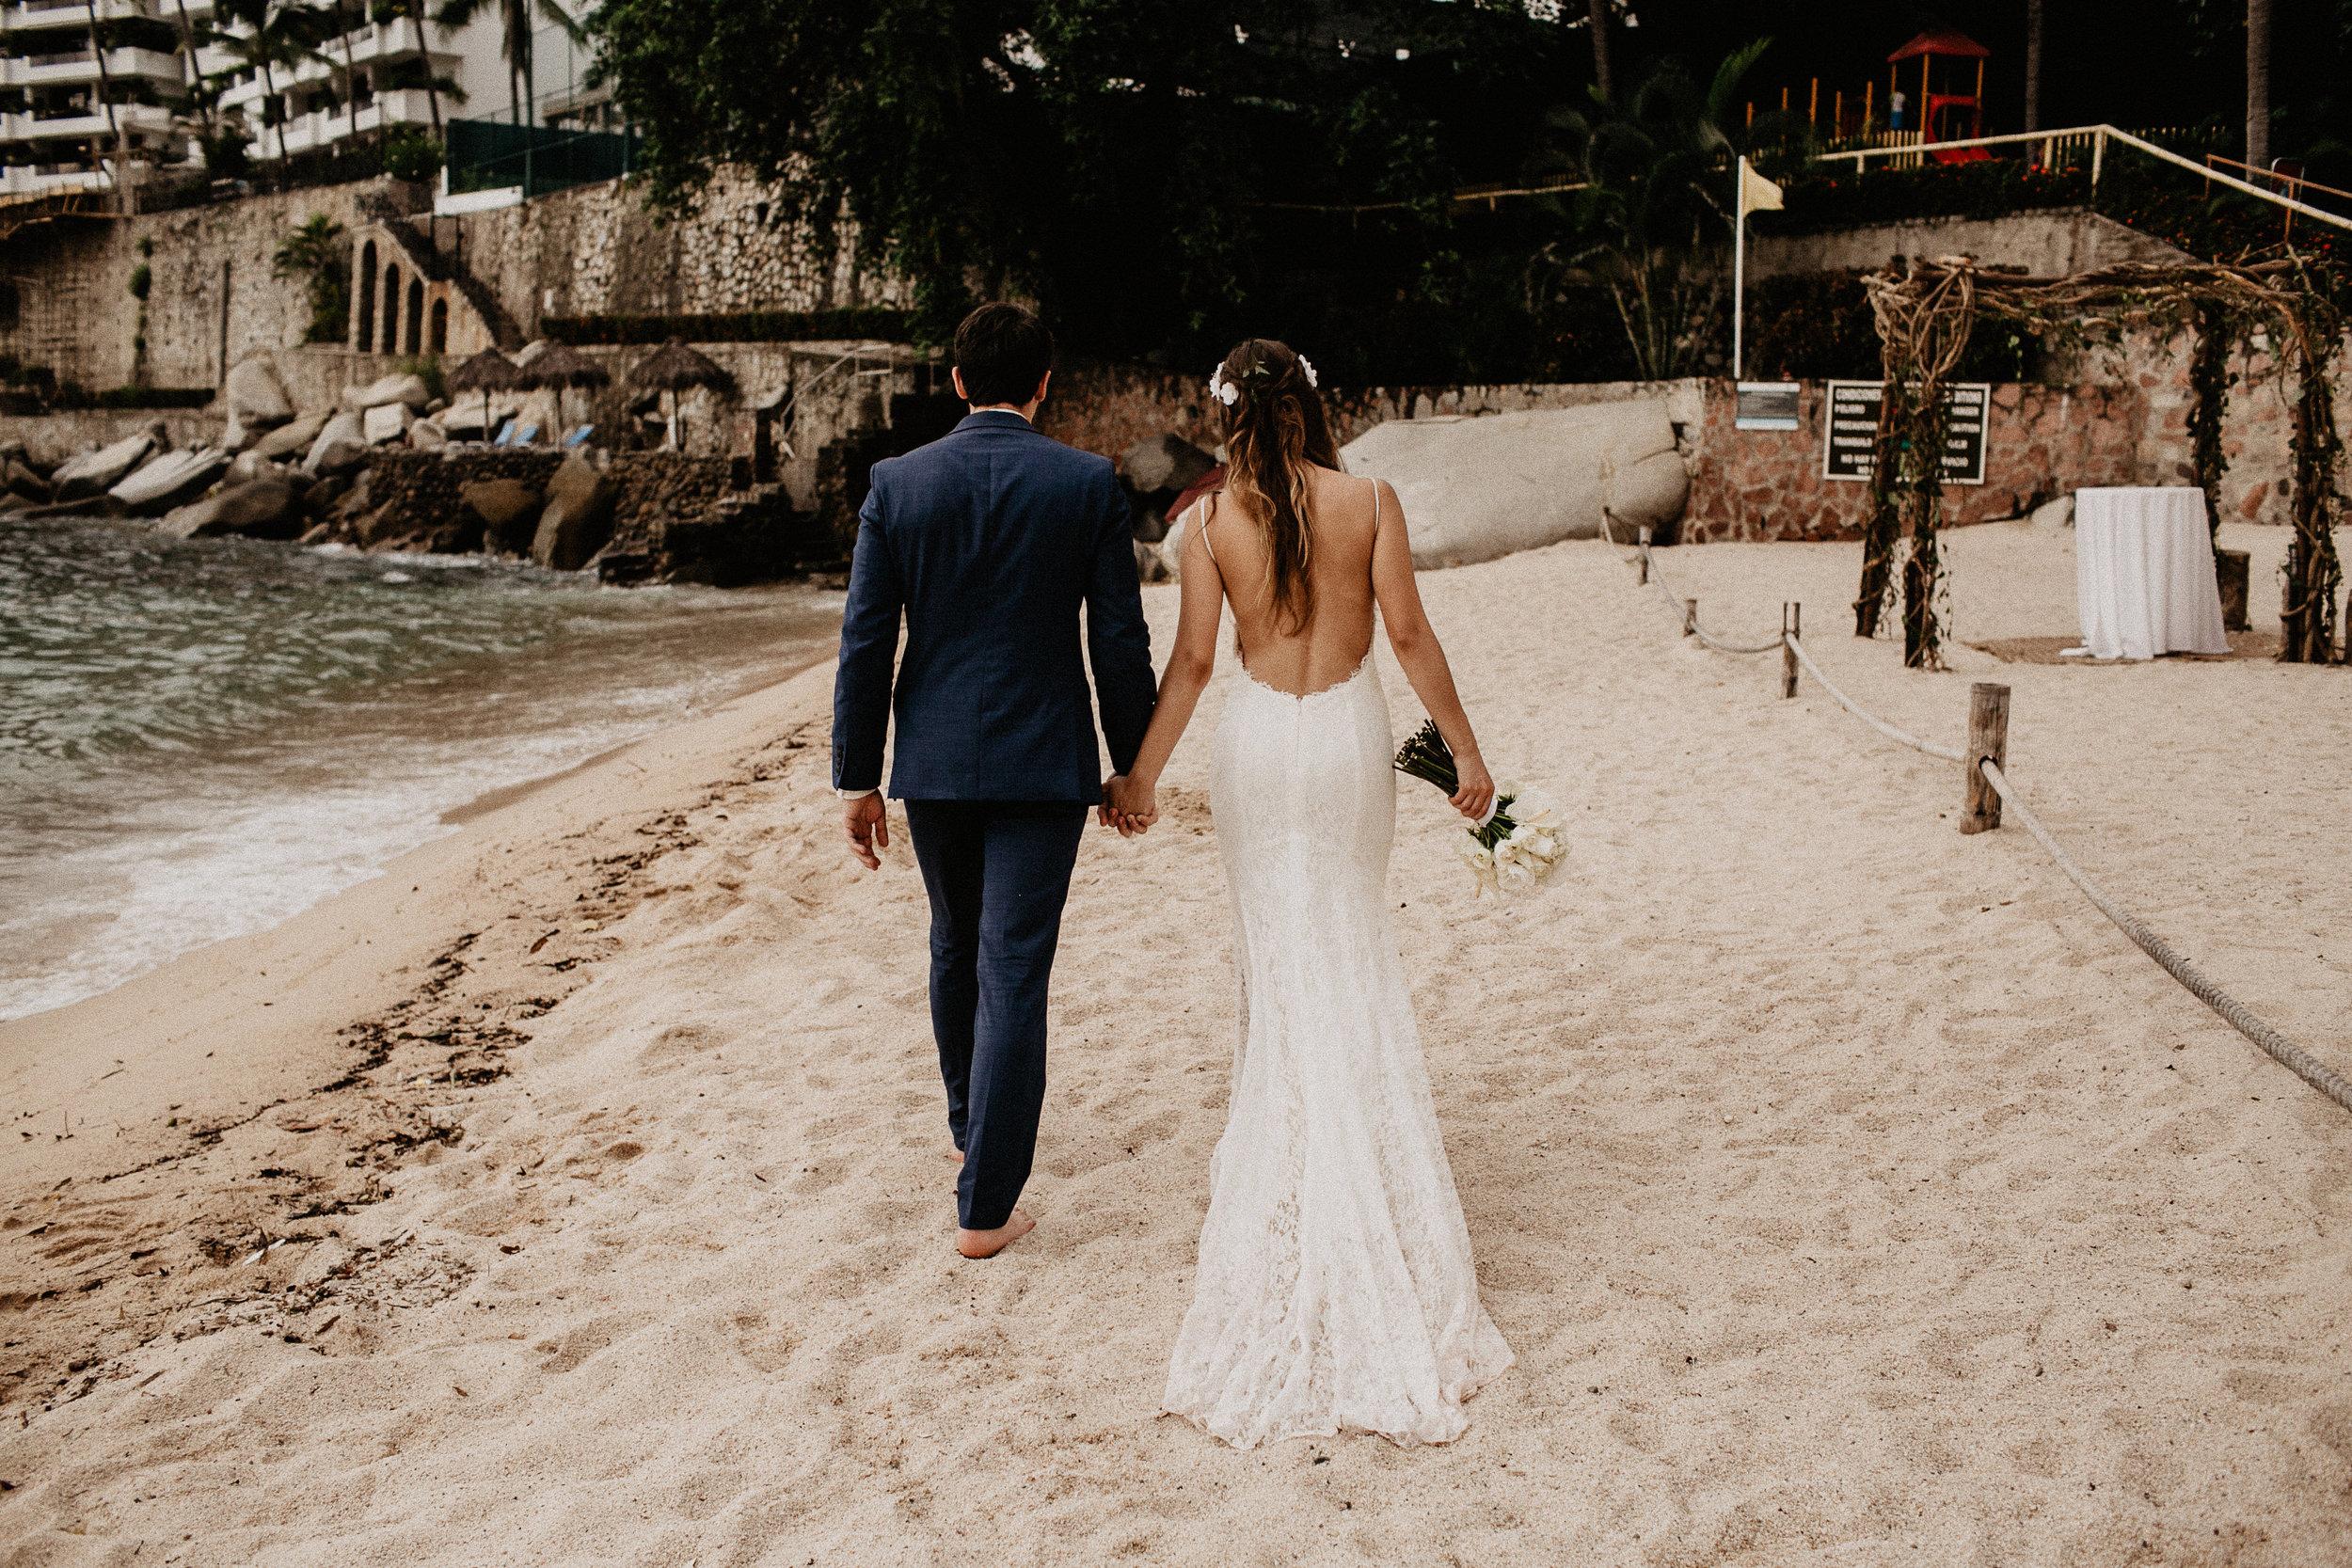 alfonso_flores_destination_wedding_photography_puerto_vallarta_hotel_barcelo_vallarta_cuttler_amela-673.JPG